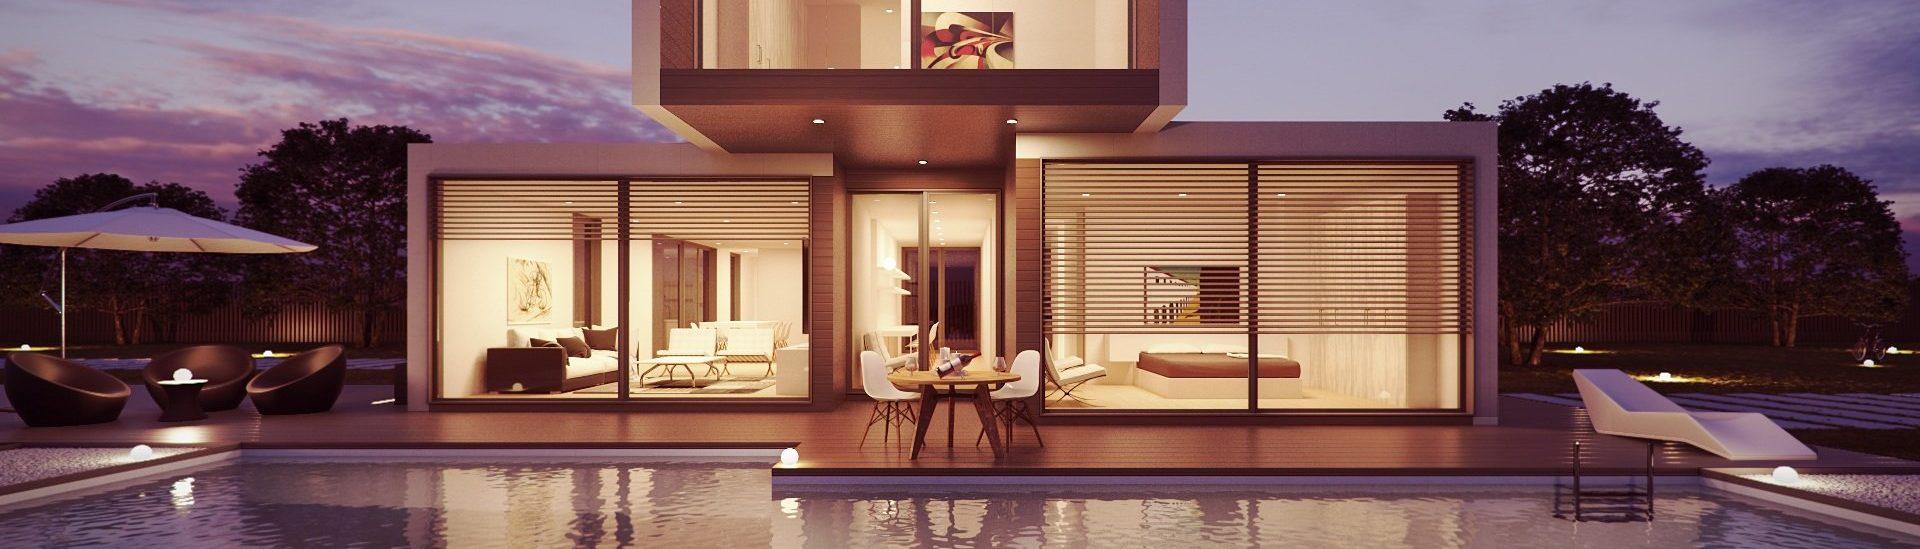 cropped-maison-vendue.jpg